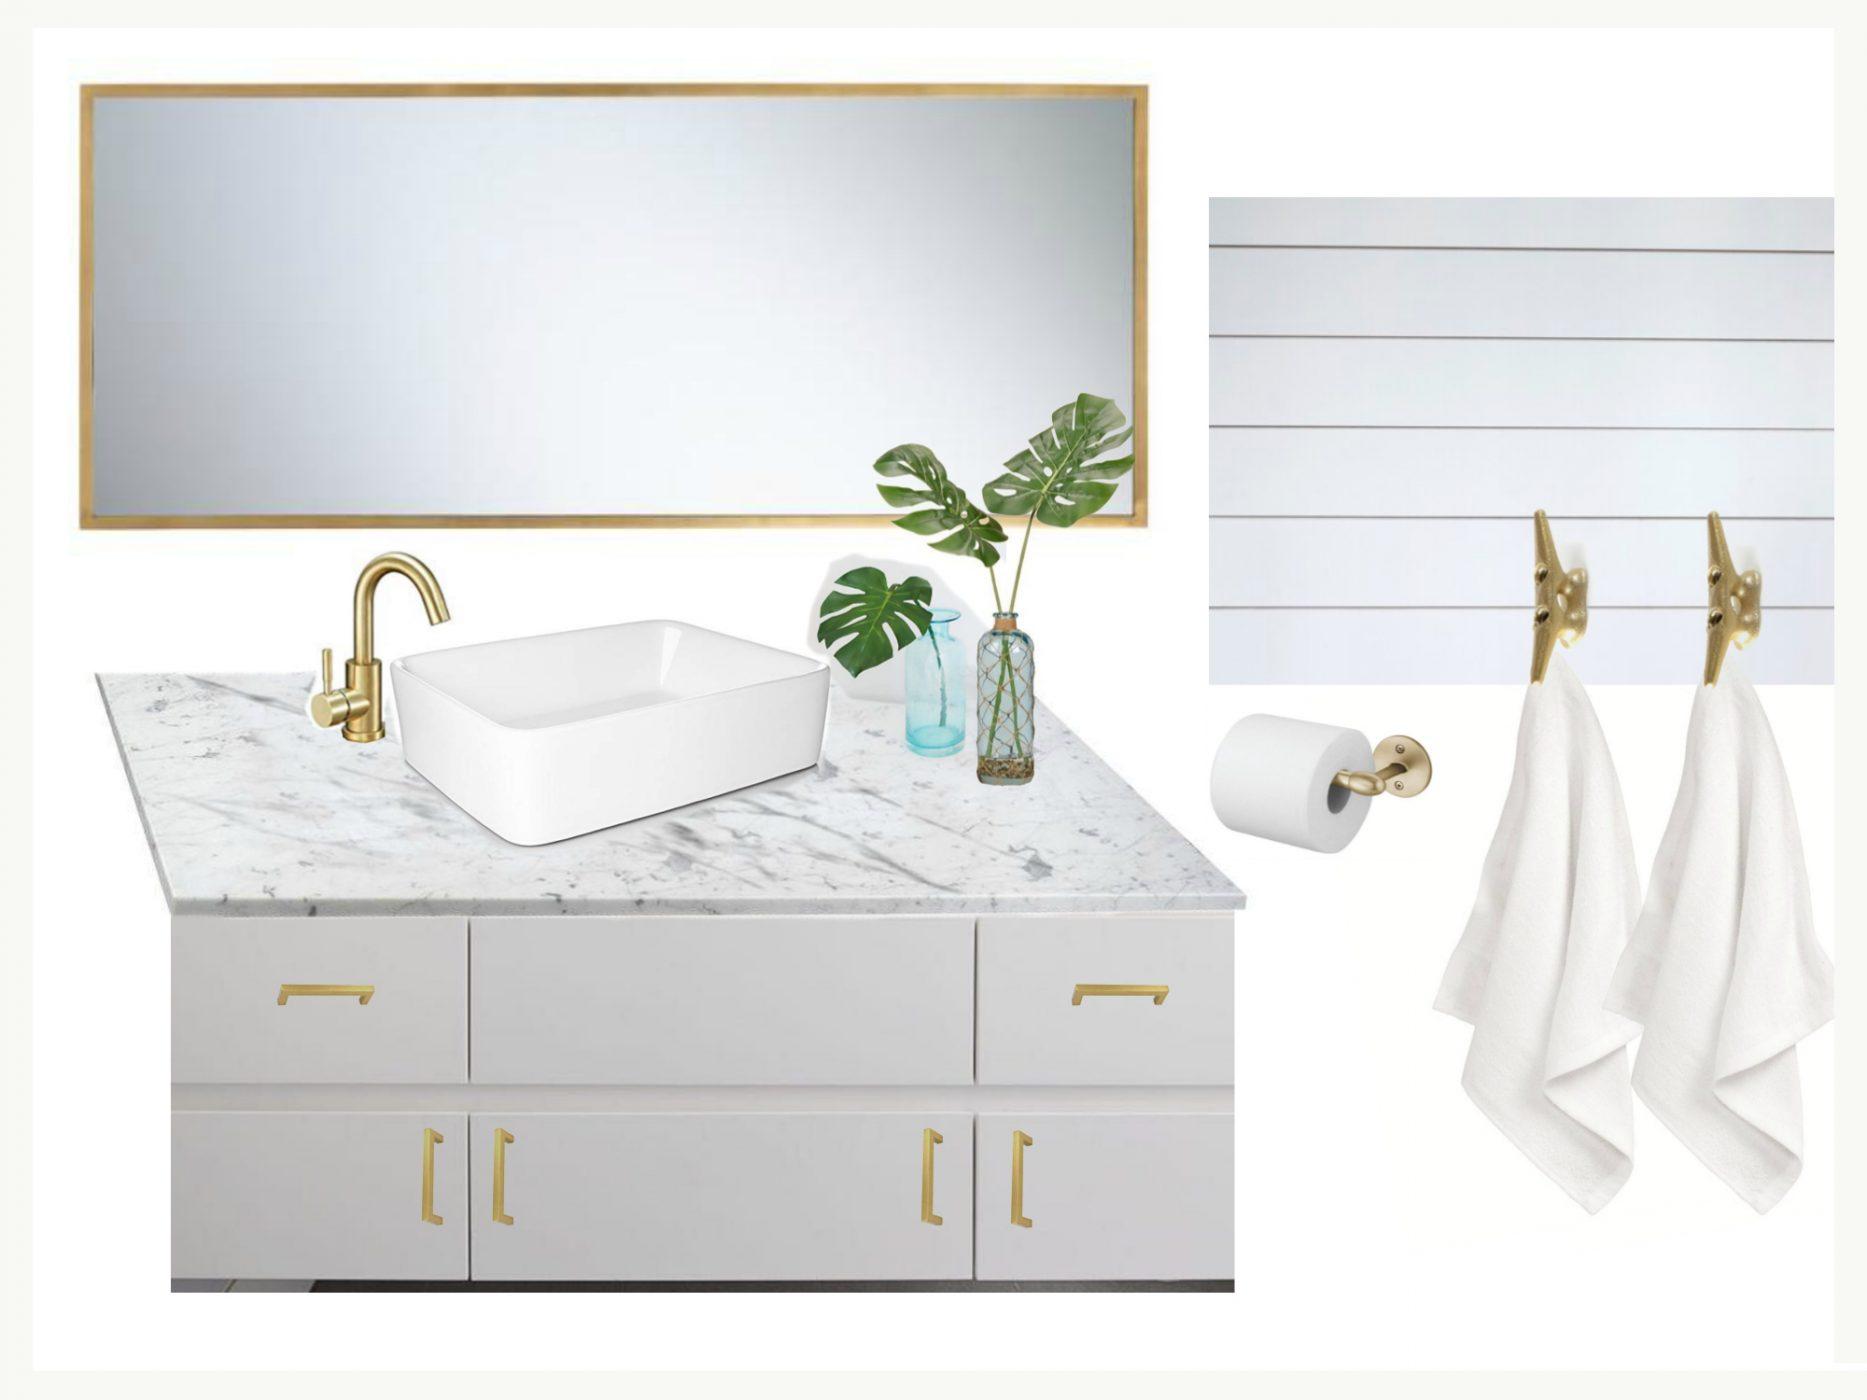 Home Renovation - Gold Nautical Bathroom Room Decorating Ideas